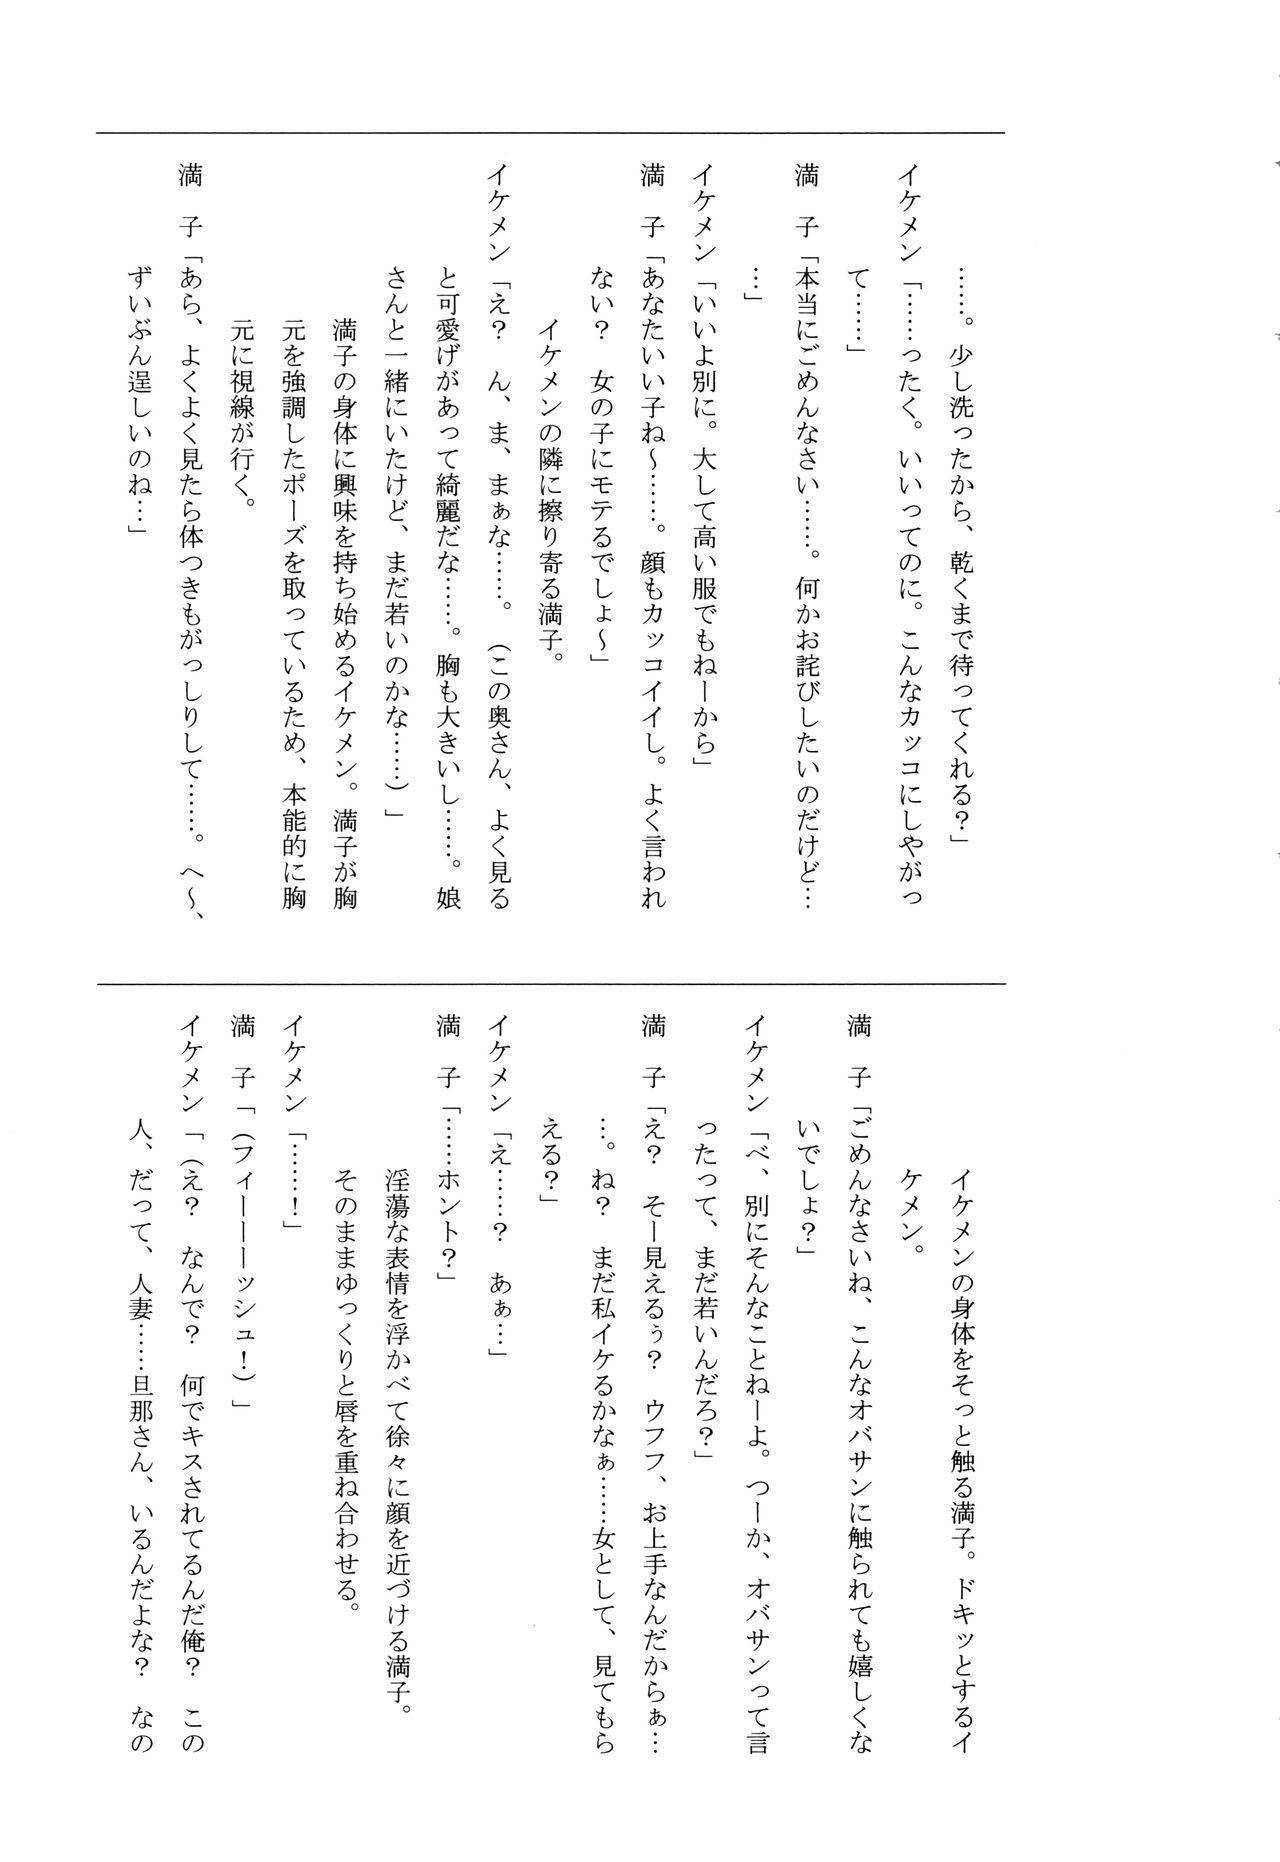 Teisou Kannen ZERO Shinsouban 1 186